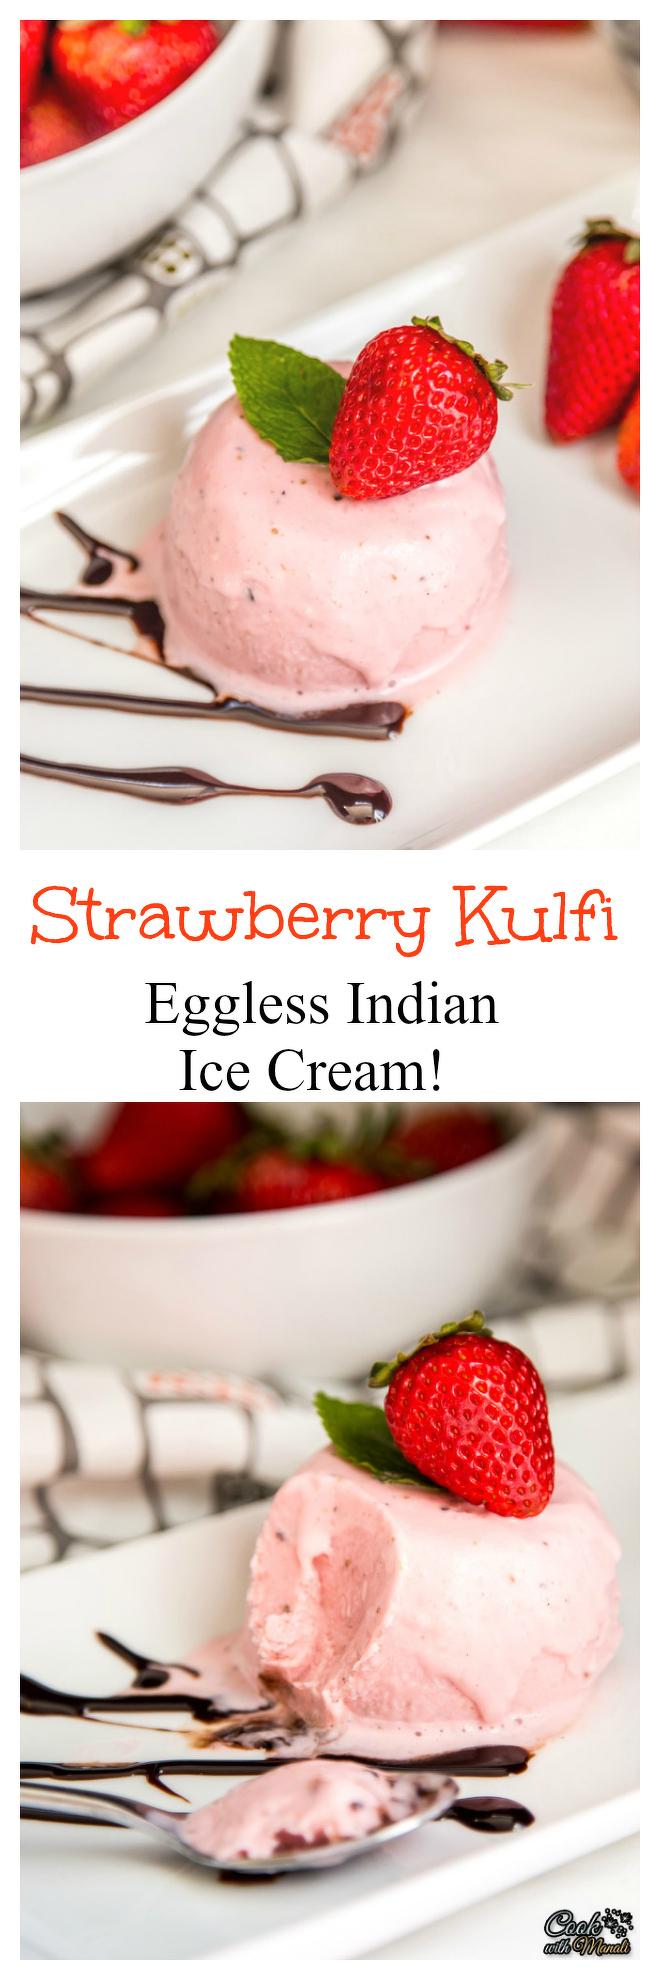 Strawberry Kulfi Collage-nocwm